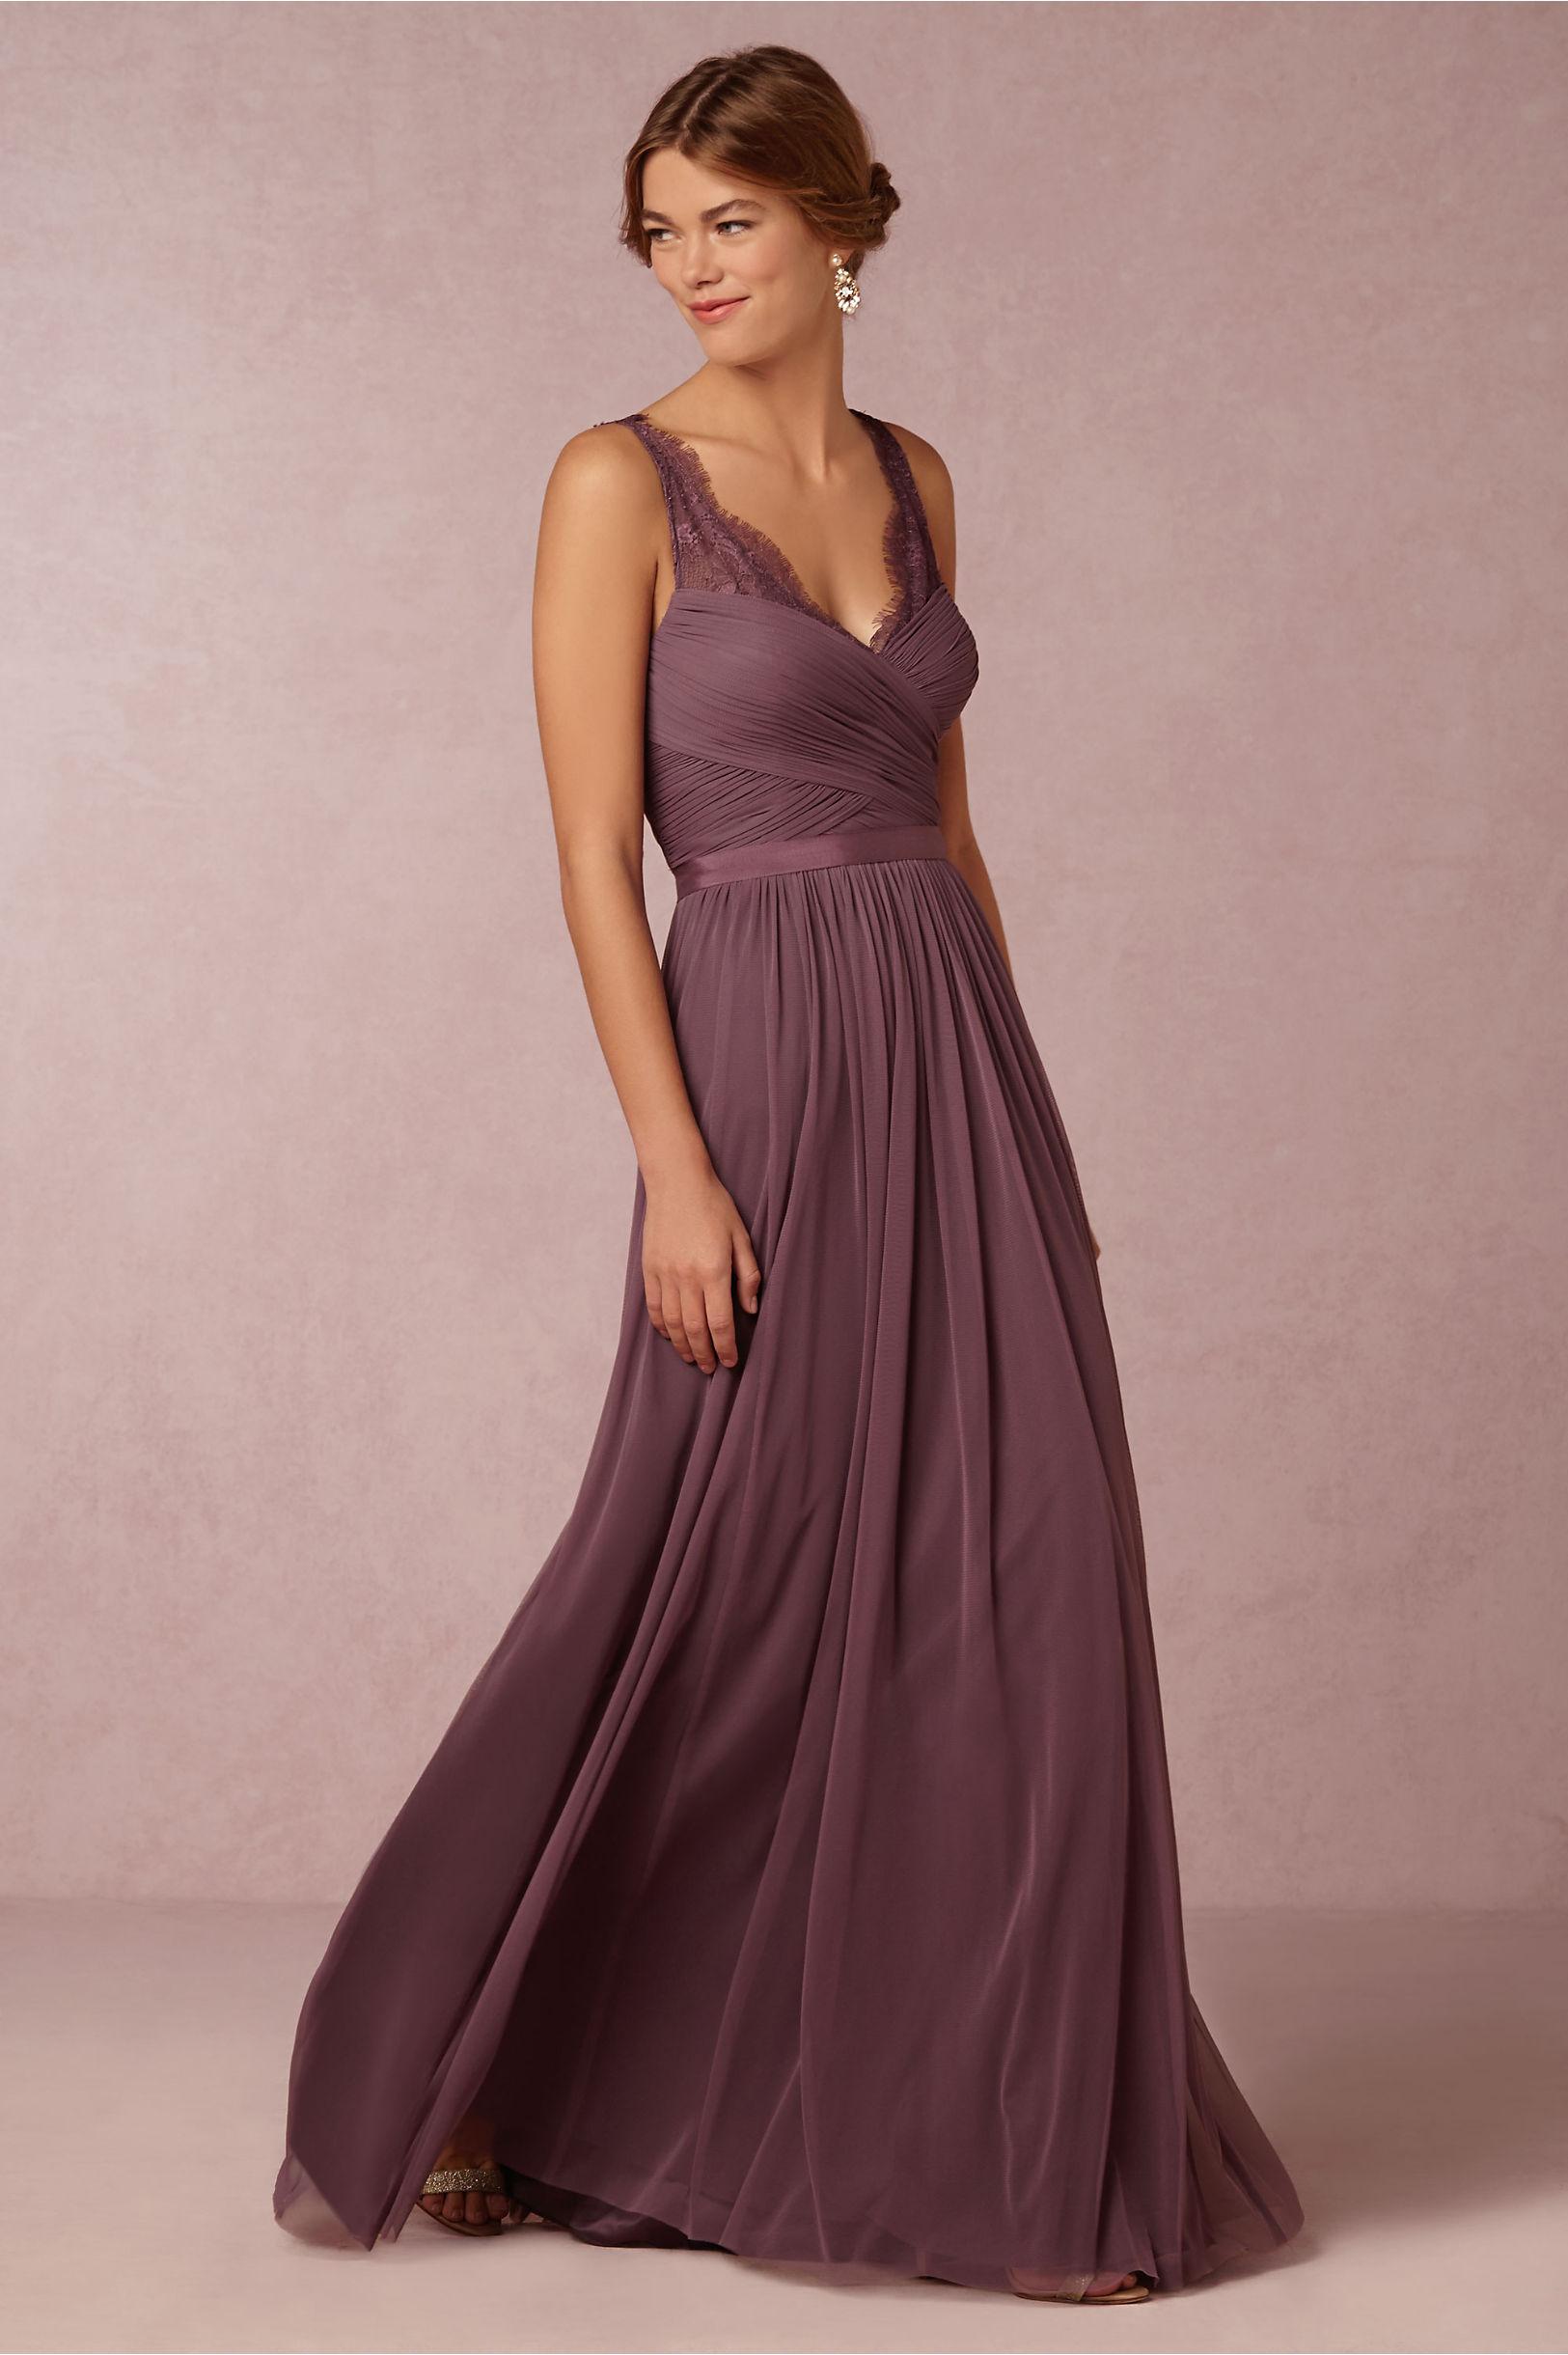 Vintage Lace Straps Pleated Long Chiffon Eggplant Bridesmaid Dress _2